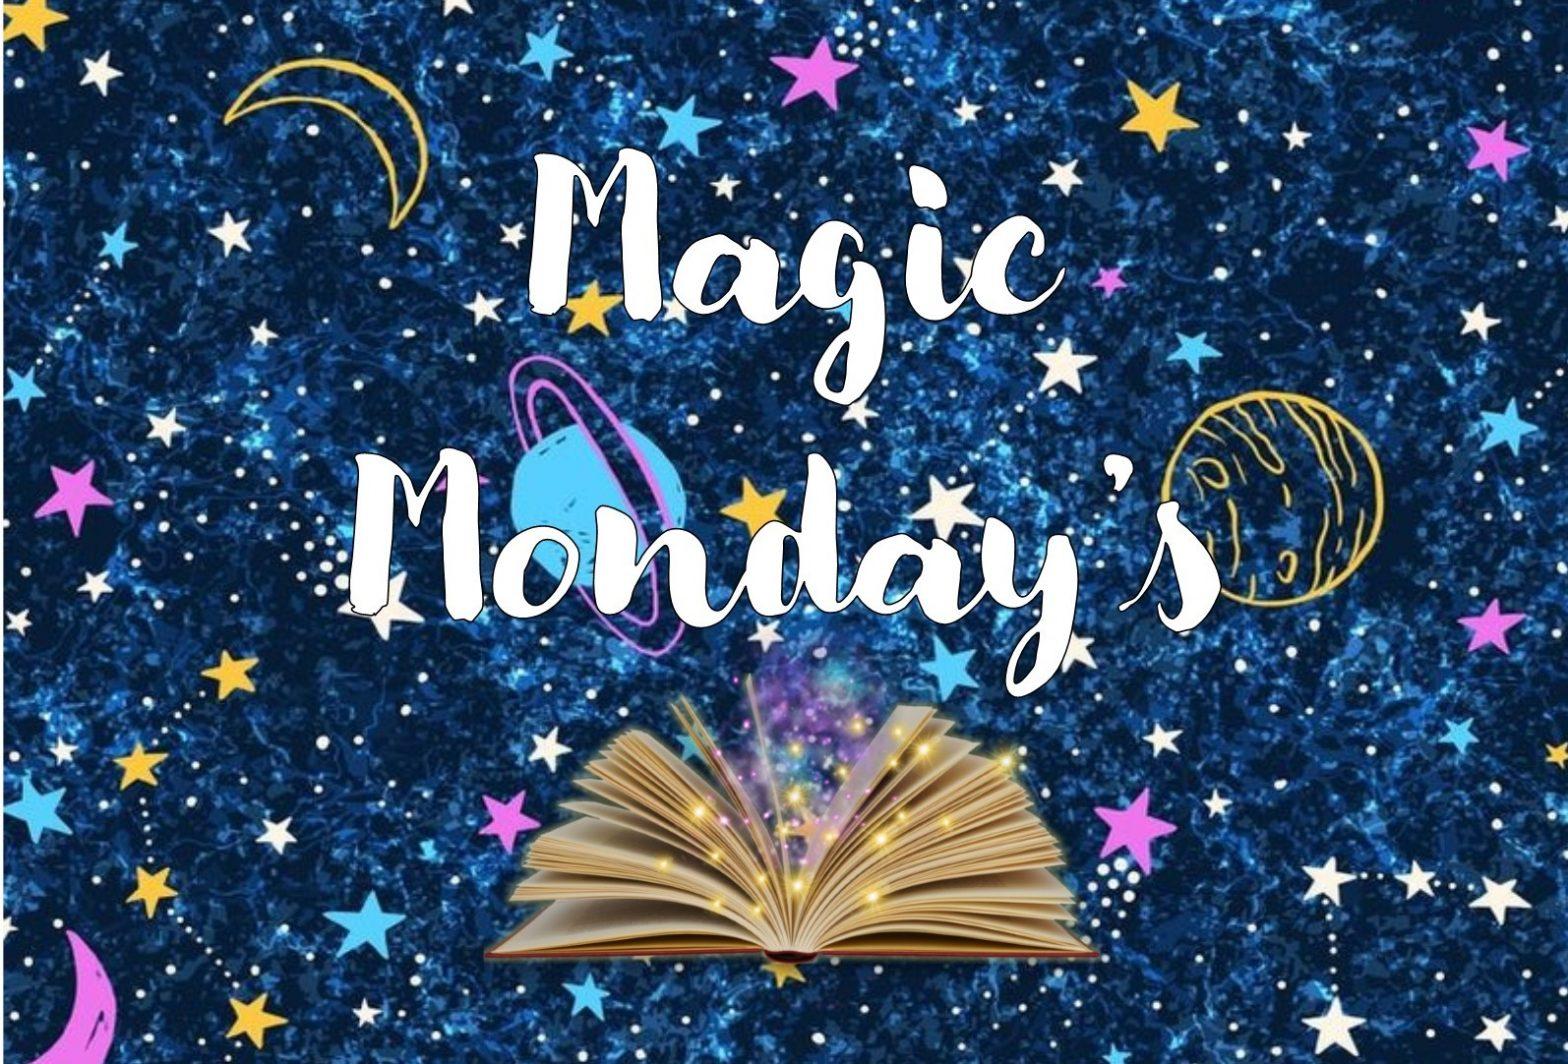 Magic Monday with The White Rabbit – Walking Theatre TV